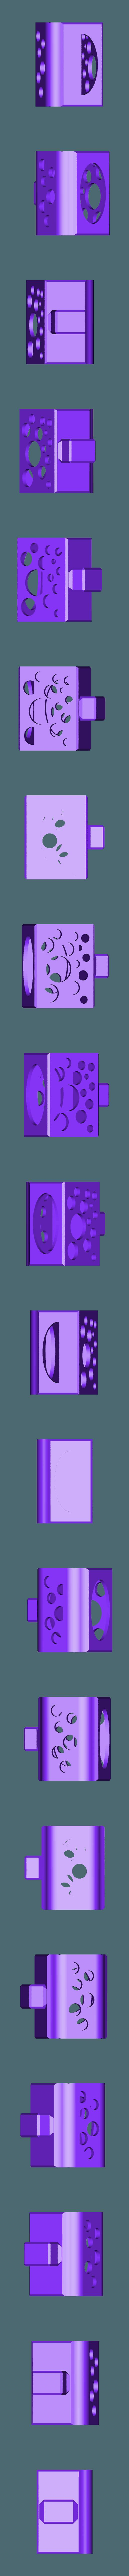 LiPo3S_holder.stl Download free STL file LiPo 3S holder for FPV goggles • 3D printer template, nik101968